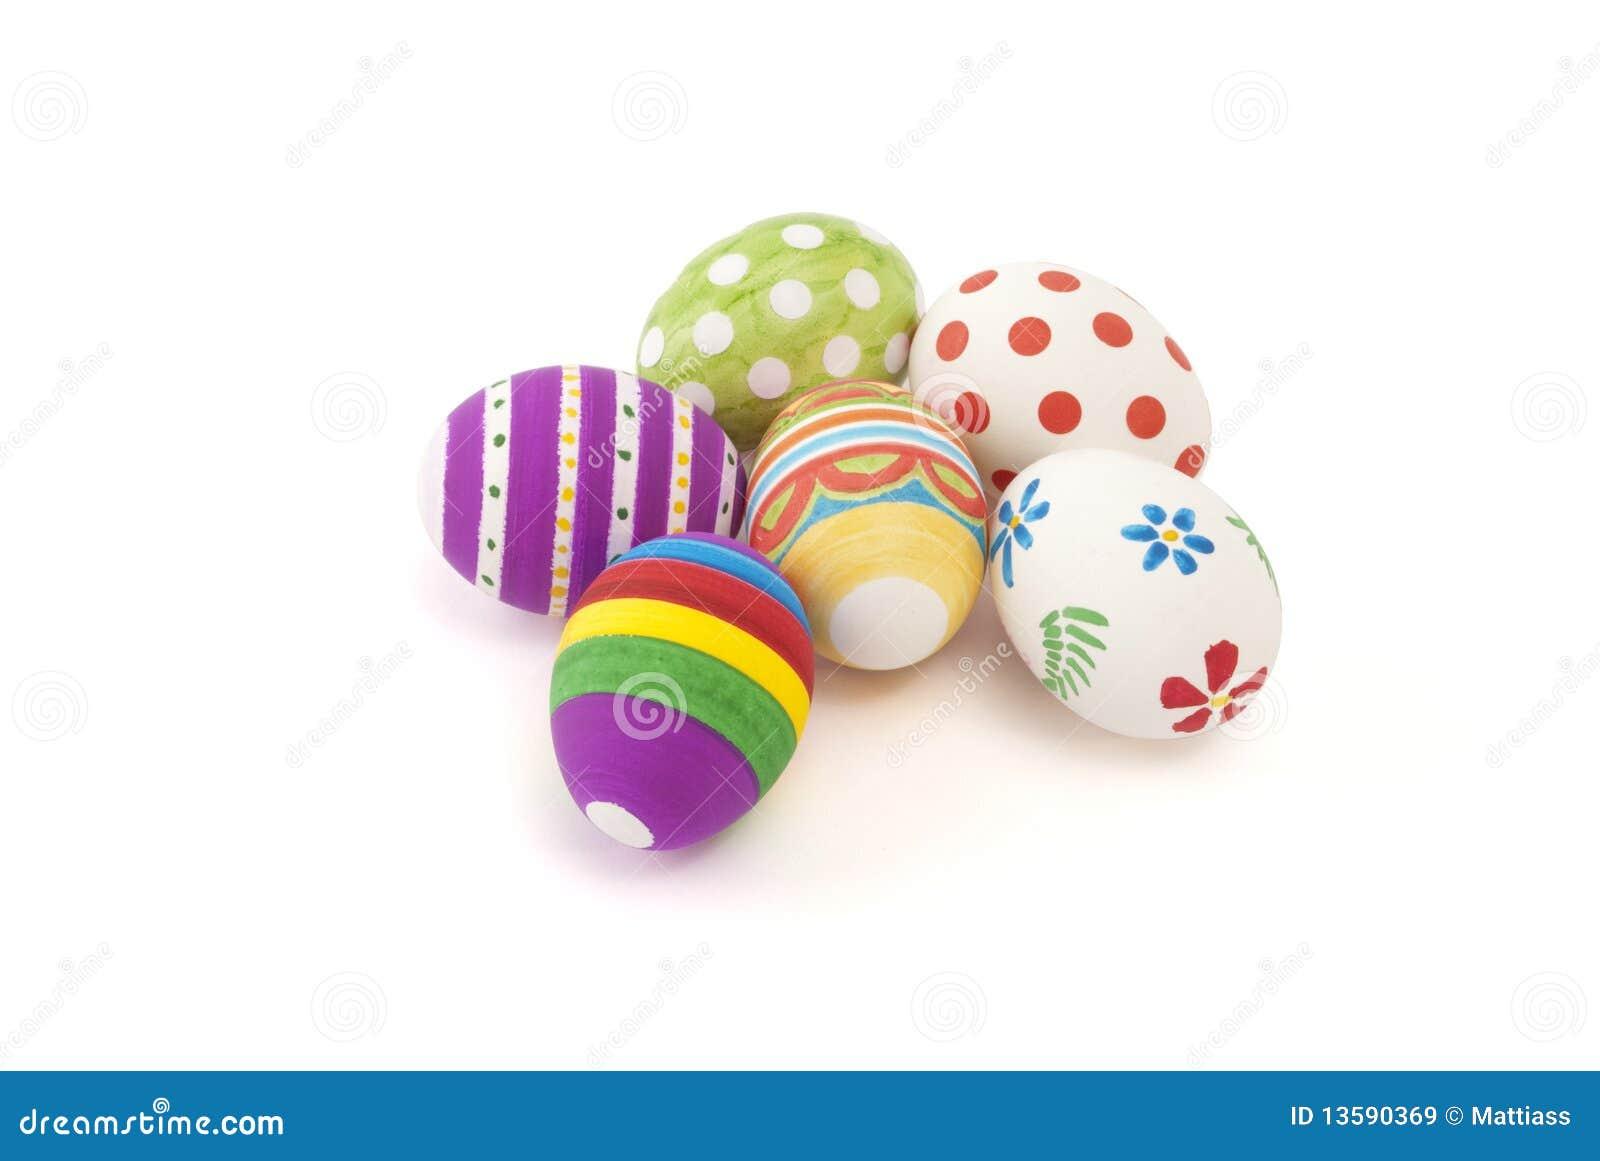 Huevos de pascua pintados a mano im genes de archivo - Videos de huevos de pascua ...